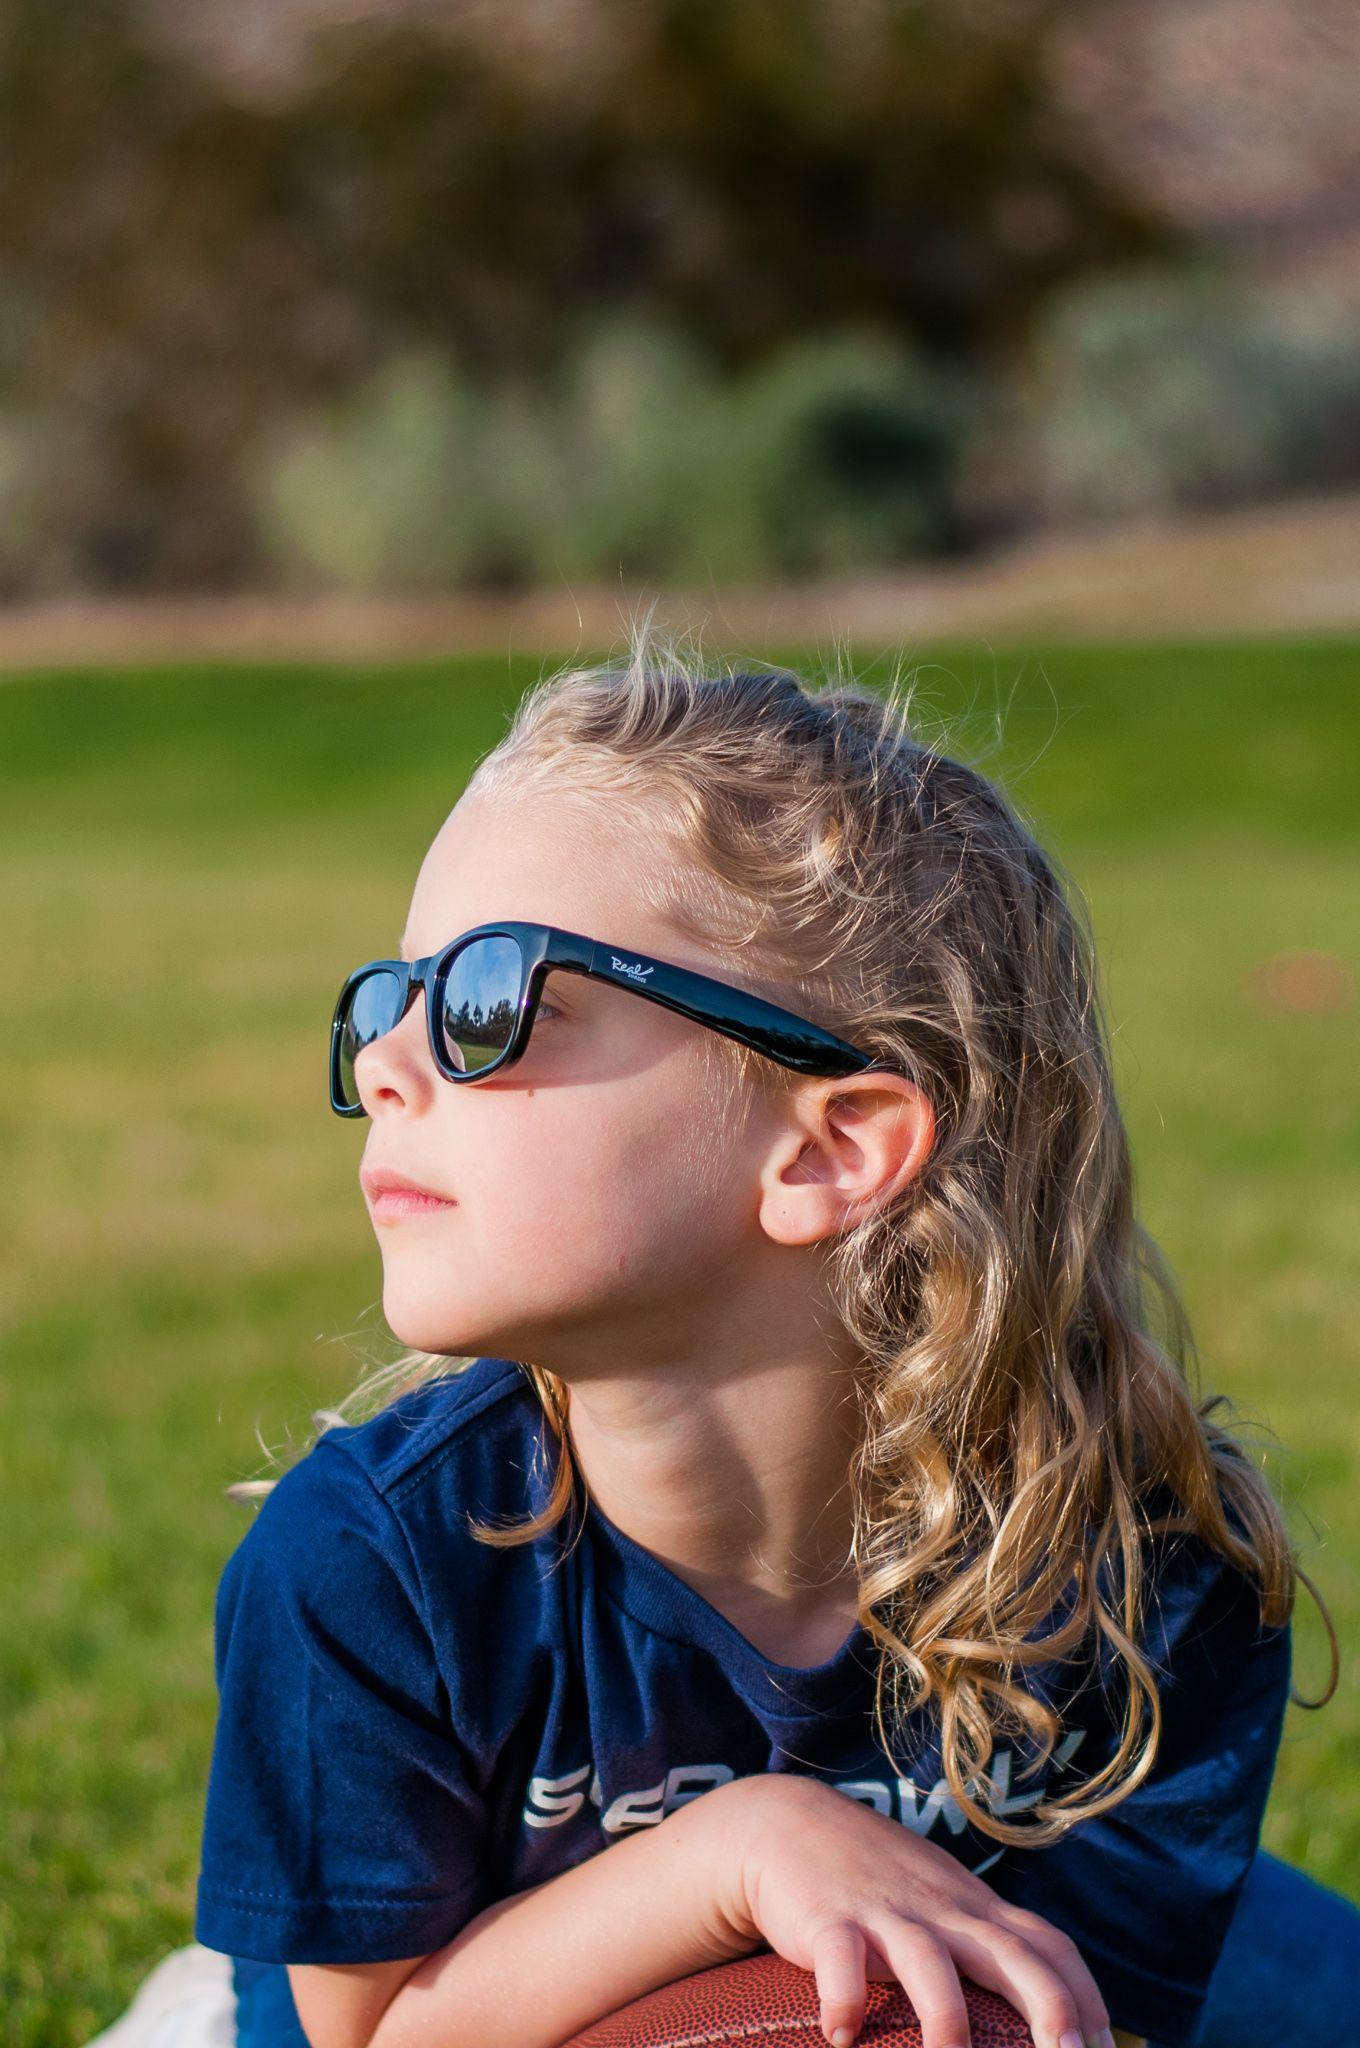 Real Shades Παιδικά  Γυαλιά Ηλίου Surf Toddler 4-6 Ετών 4SURBLK